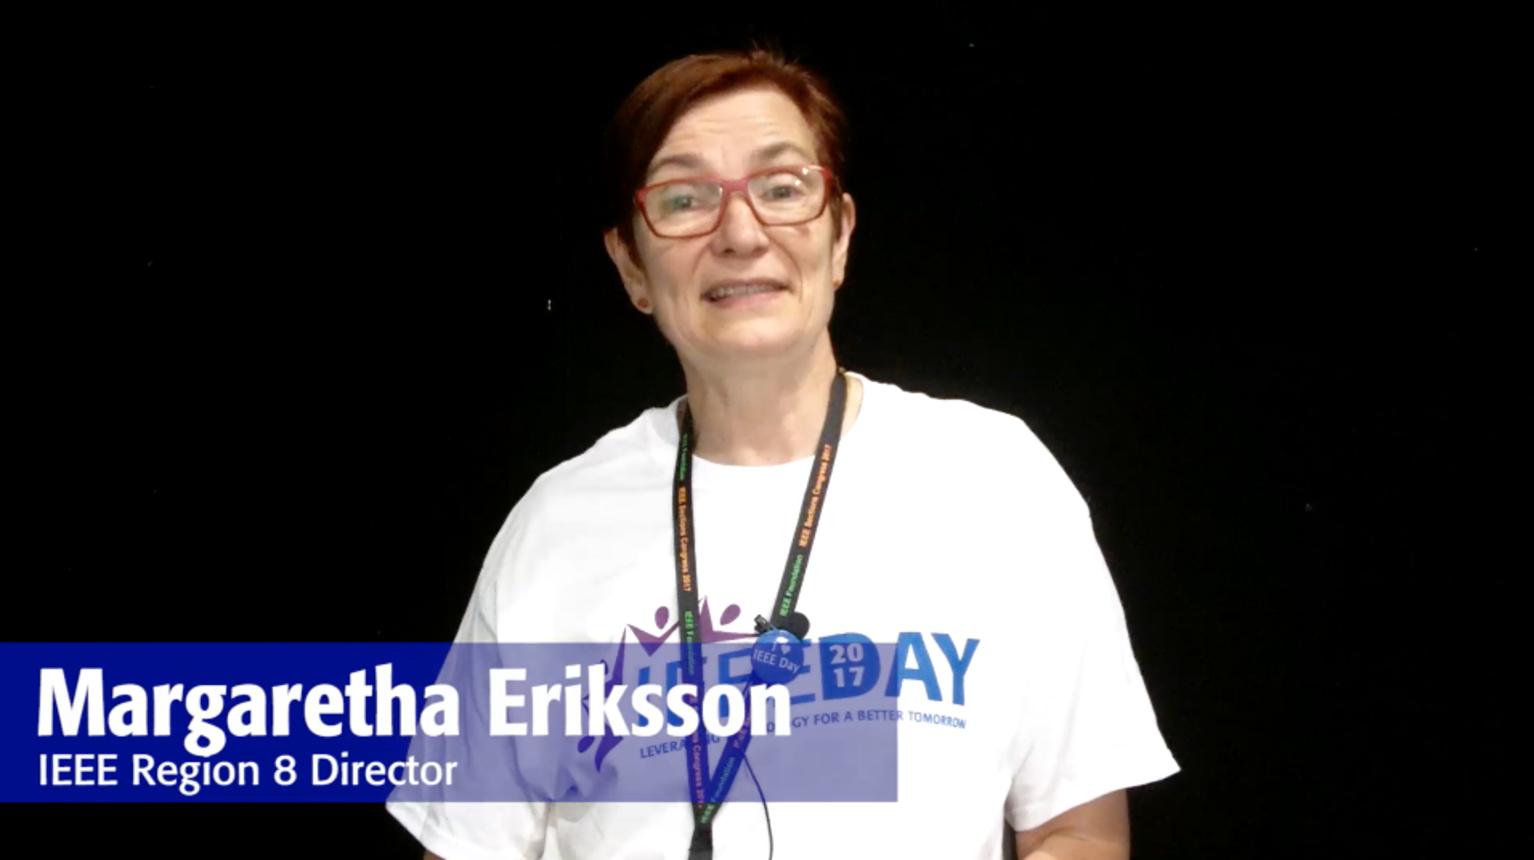 IEEE Day 2017 Testimonial: Margaretha Eriksson